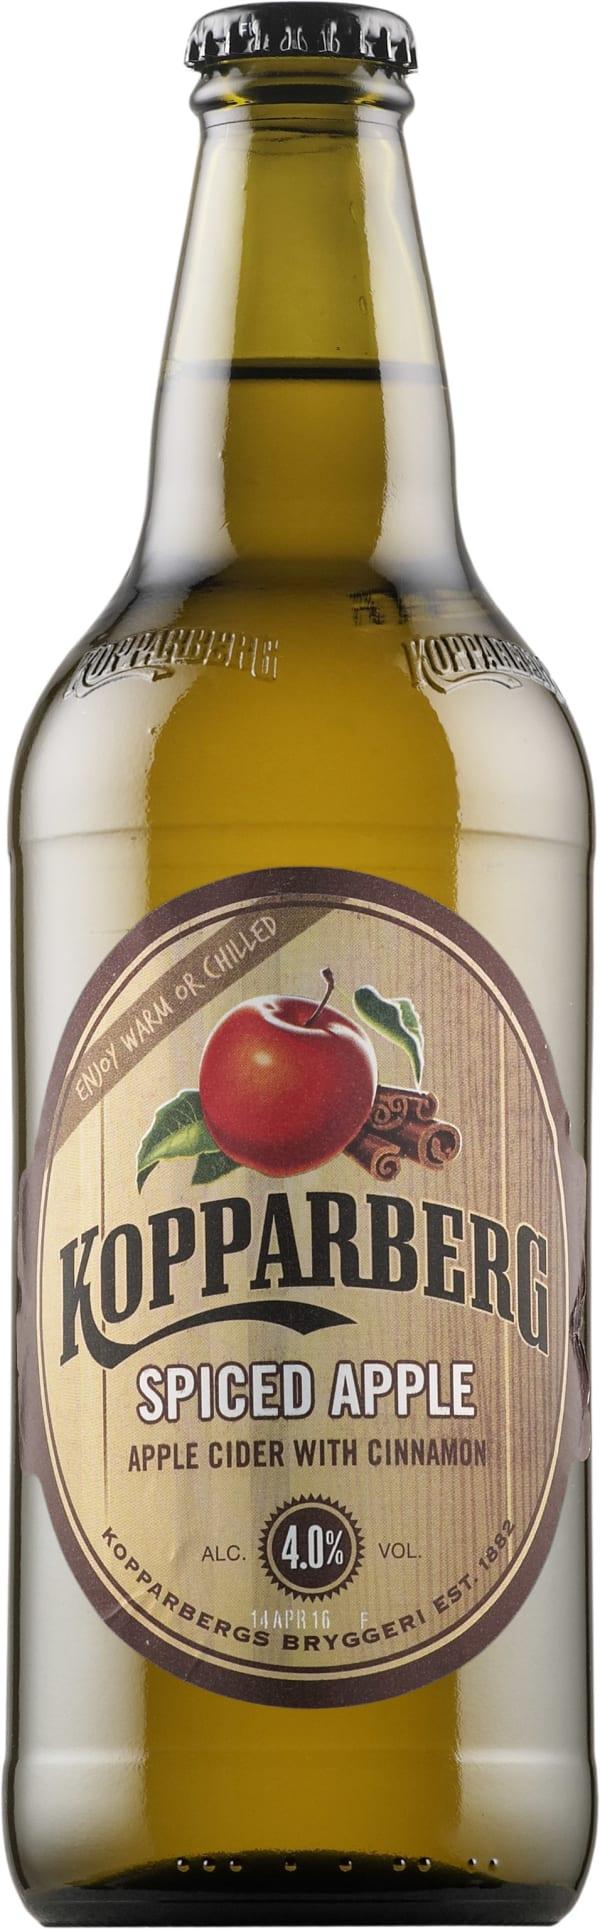 Kopparberg Spiced Apple